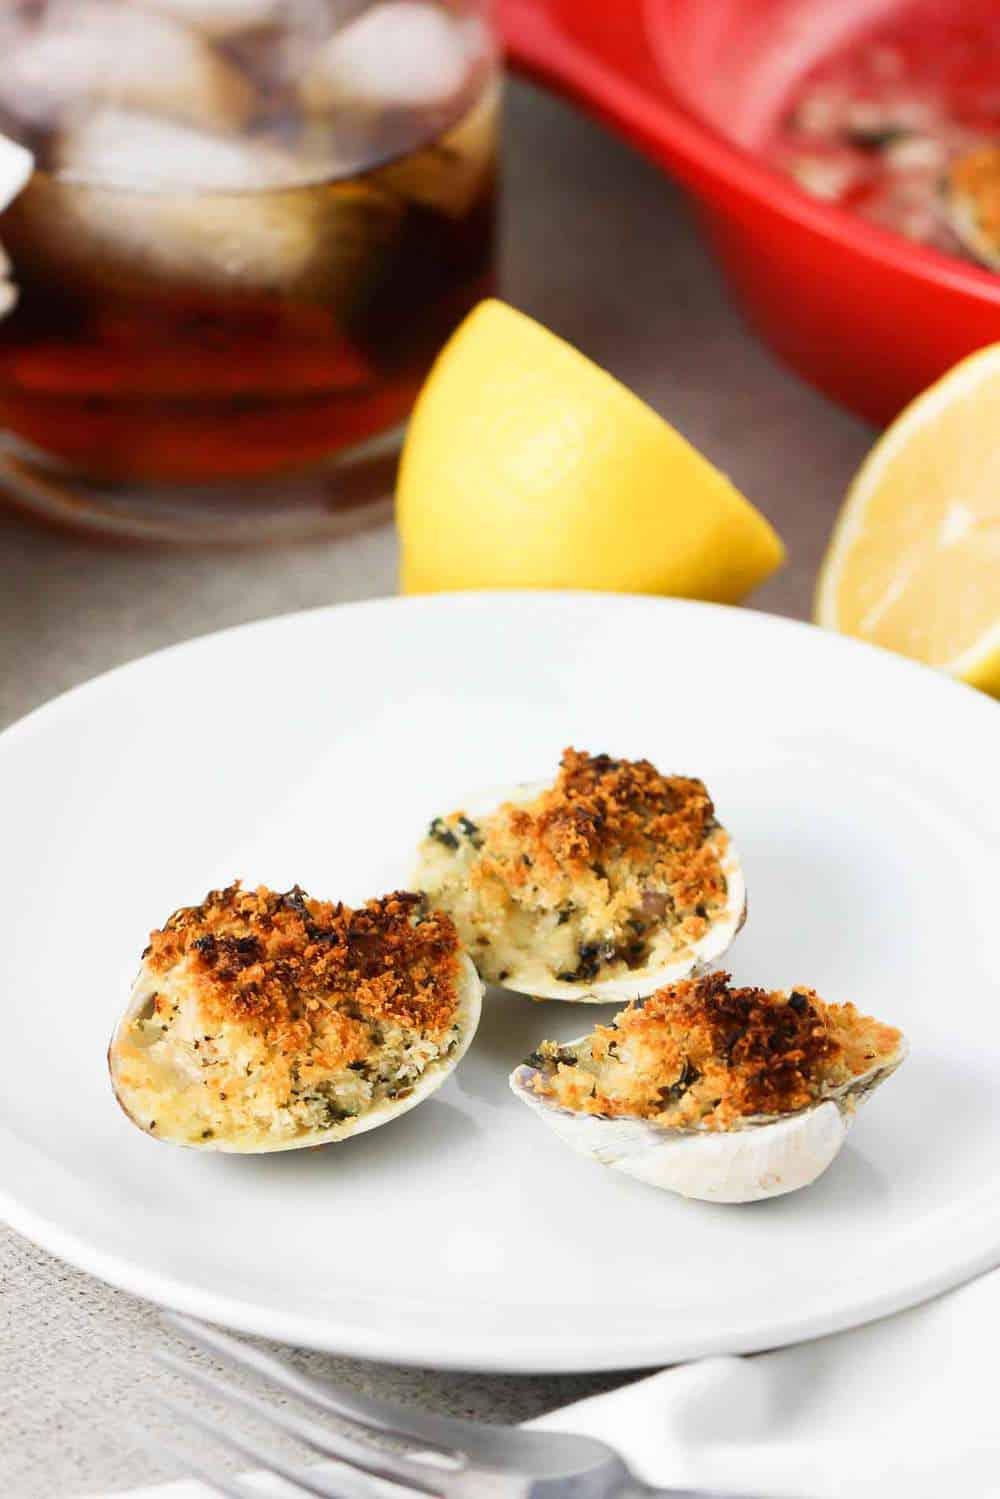 baked clams recipe